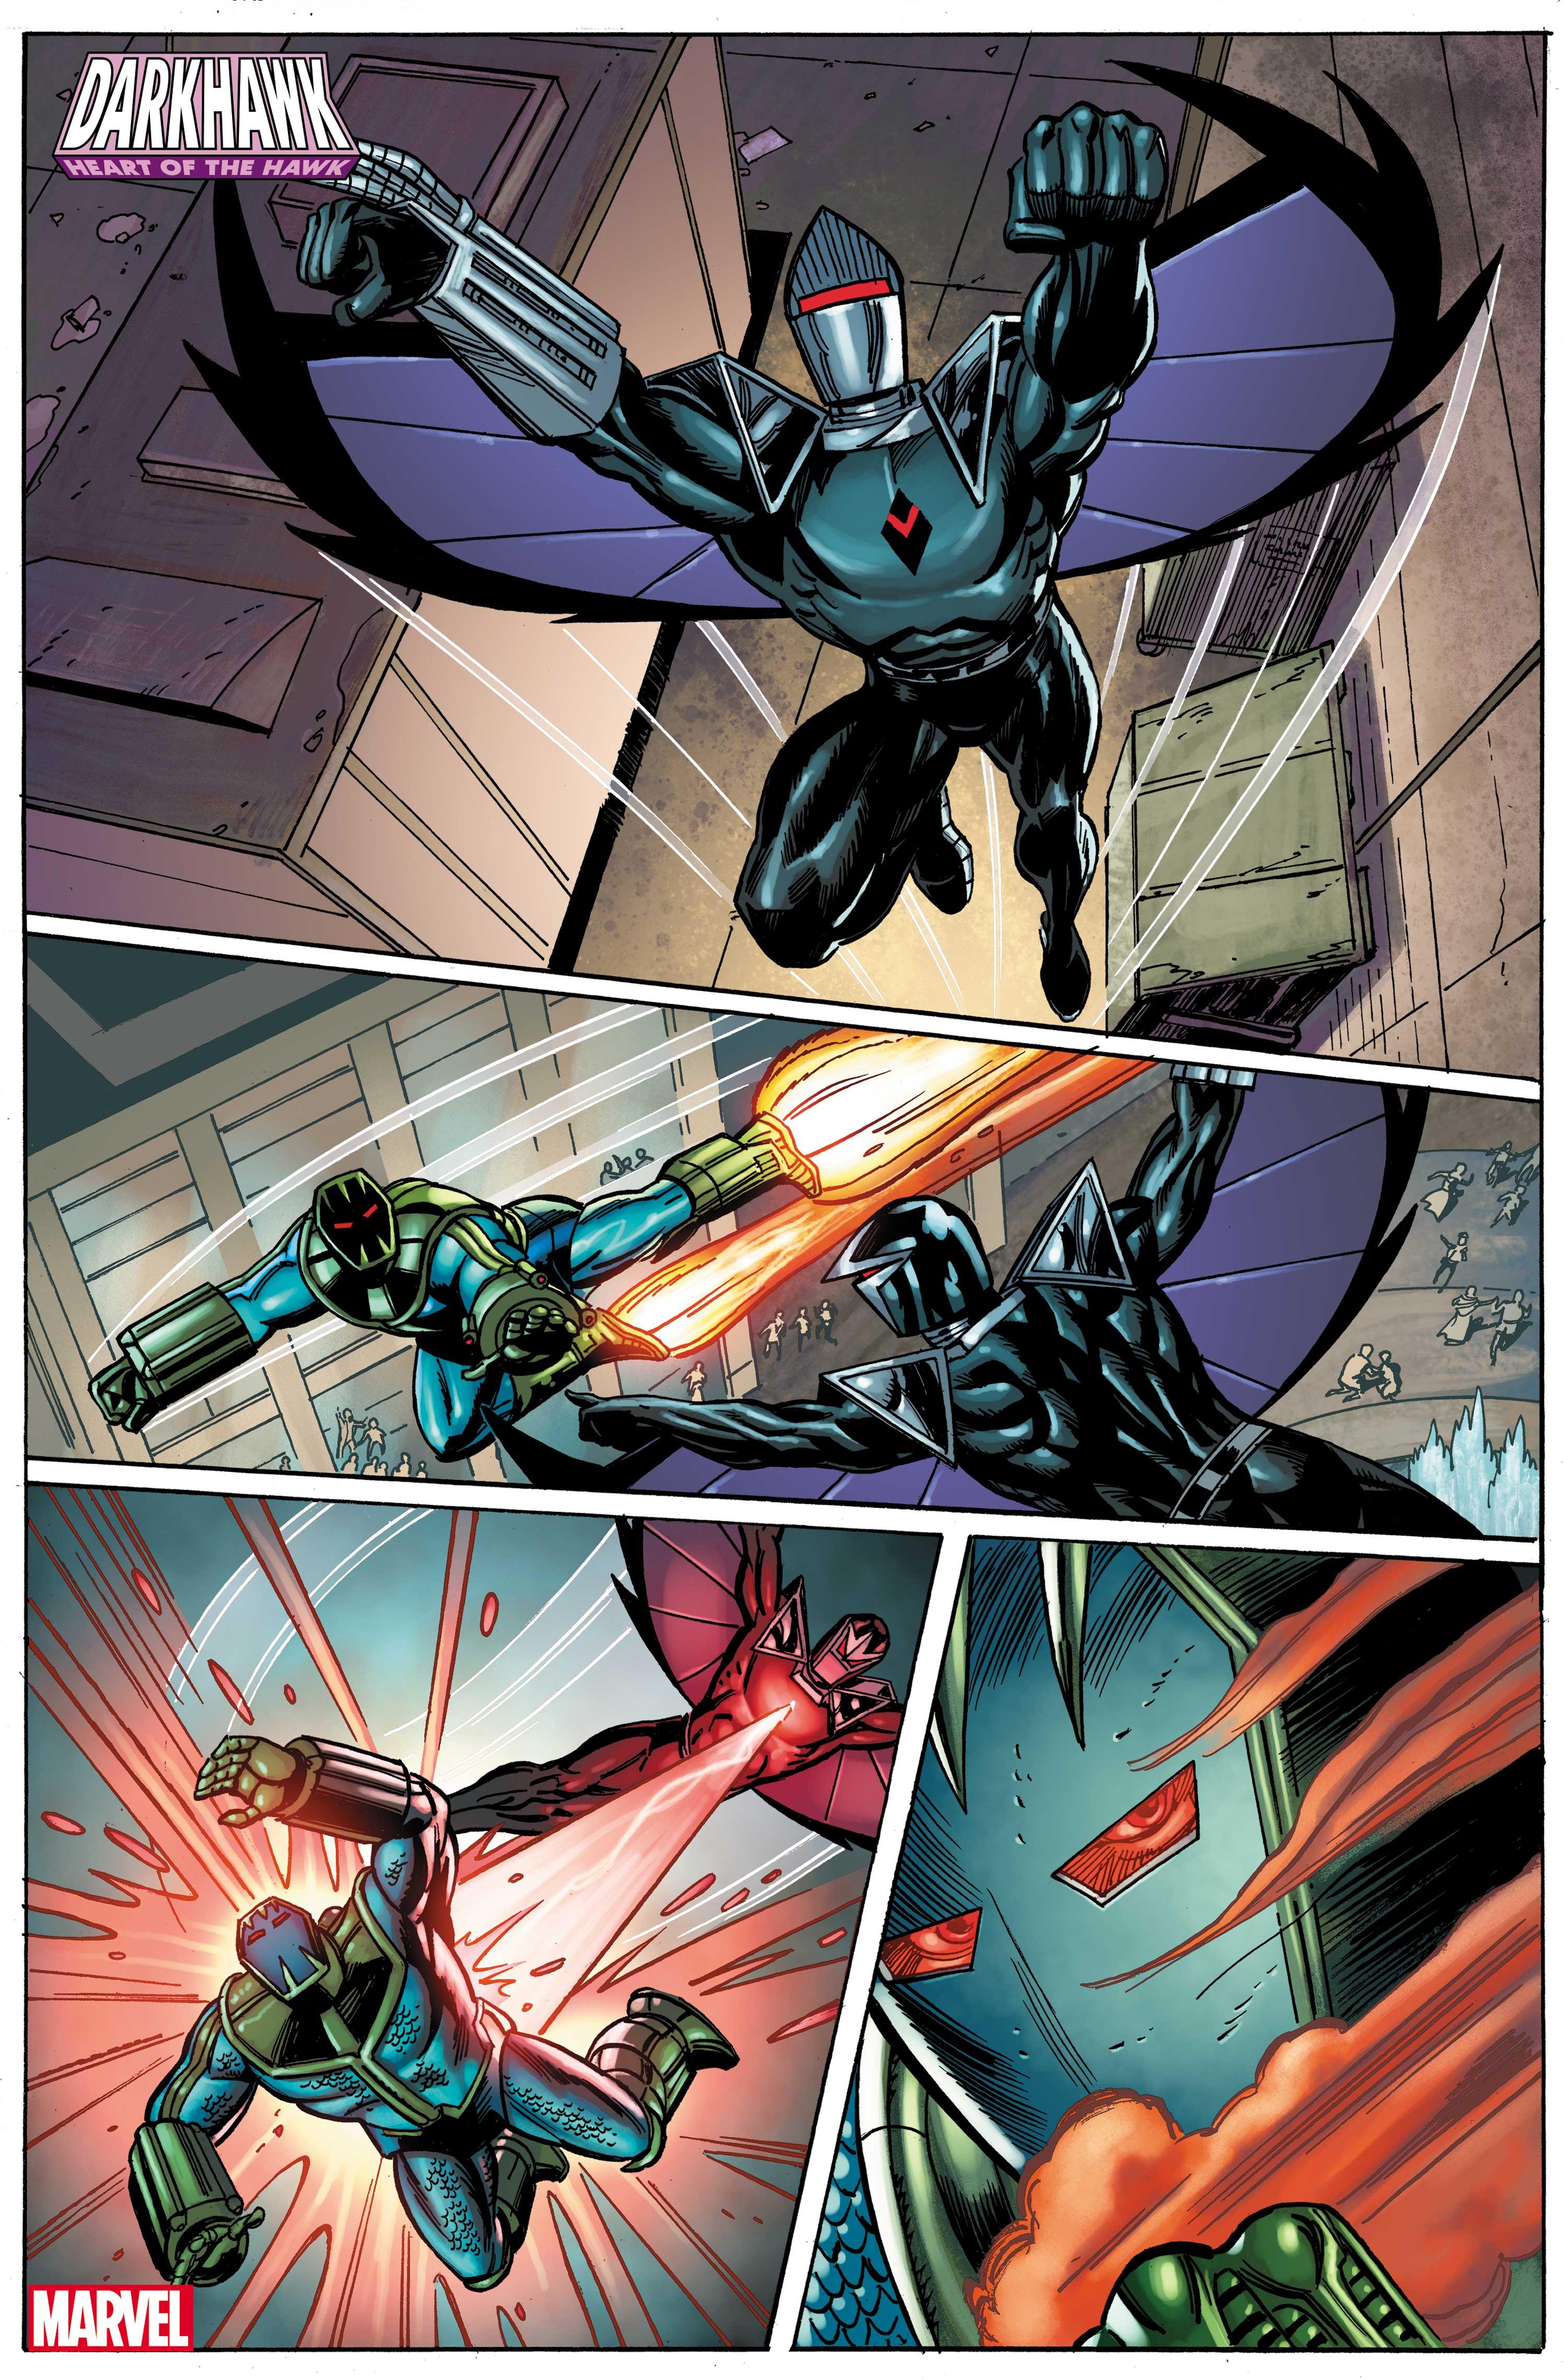 Darkhawk: Heart of the Hawk # 1